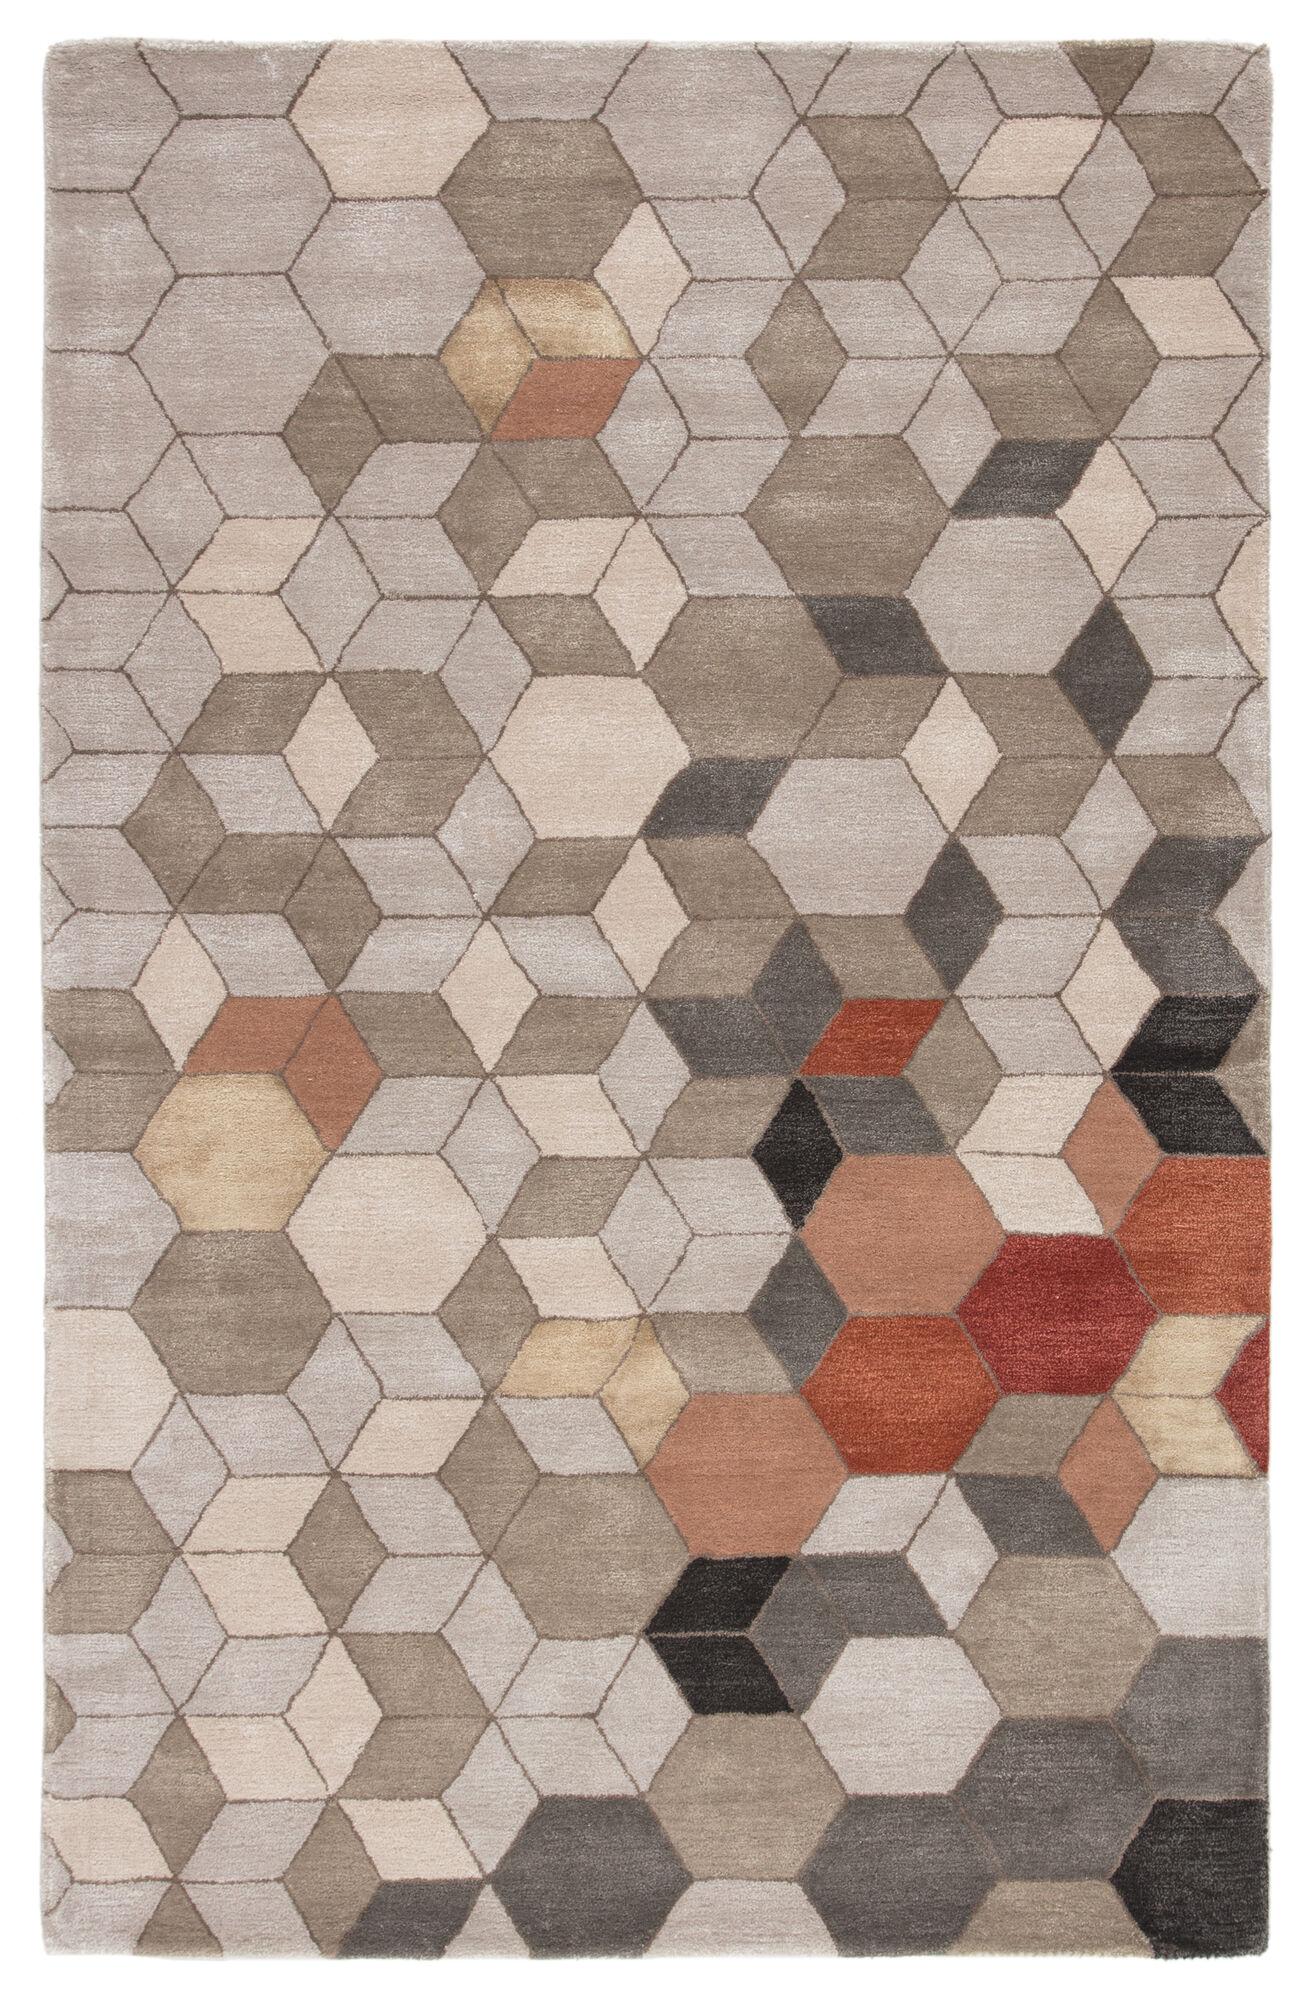 Combs Handmade Geometric Light Gray Orange Area Rug 5 X8 Mathis Brothers Furniture